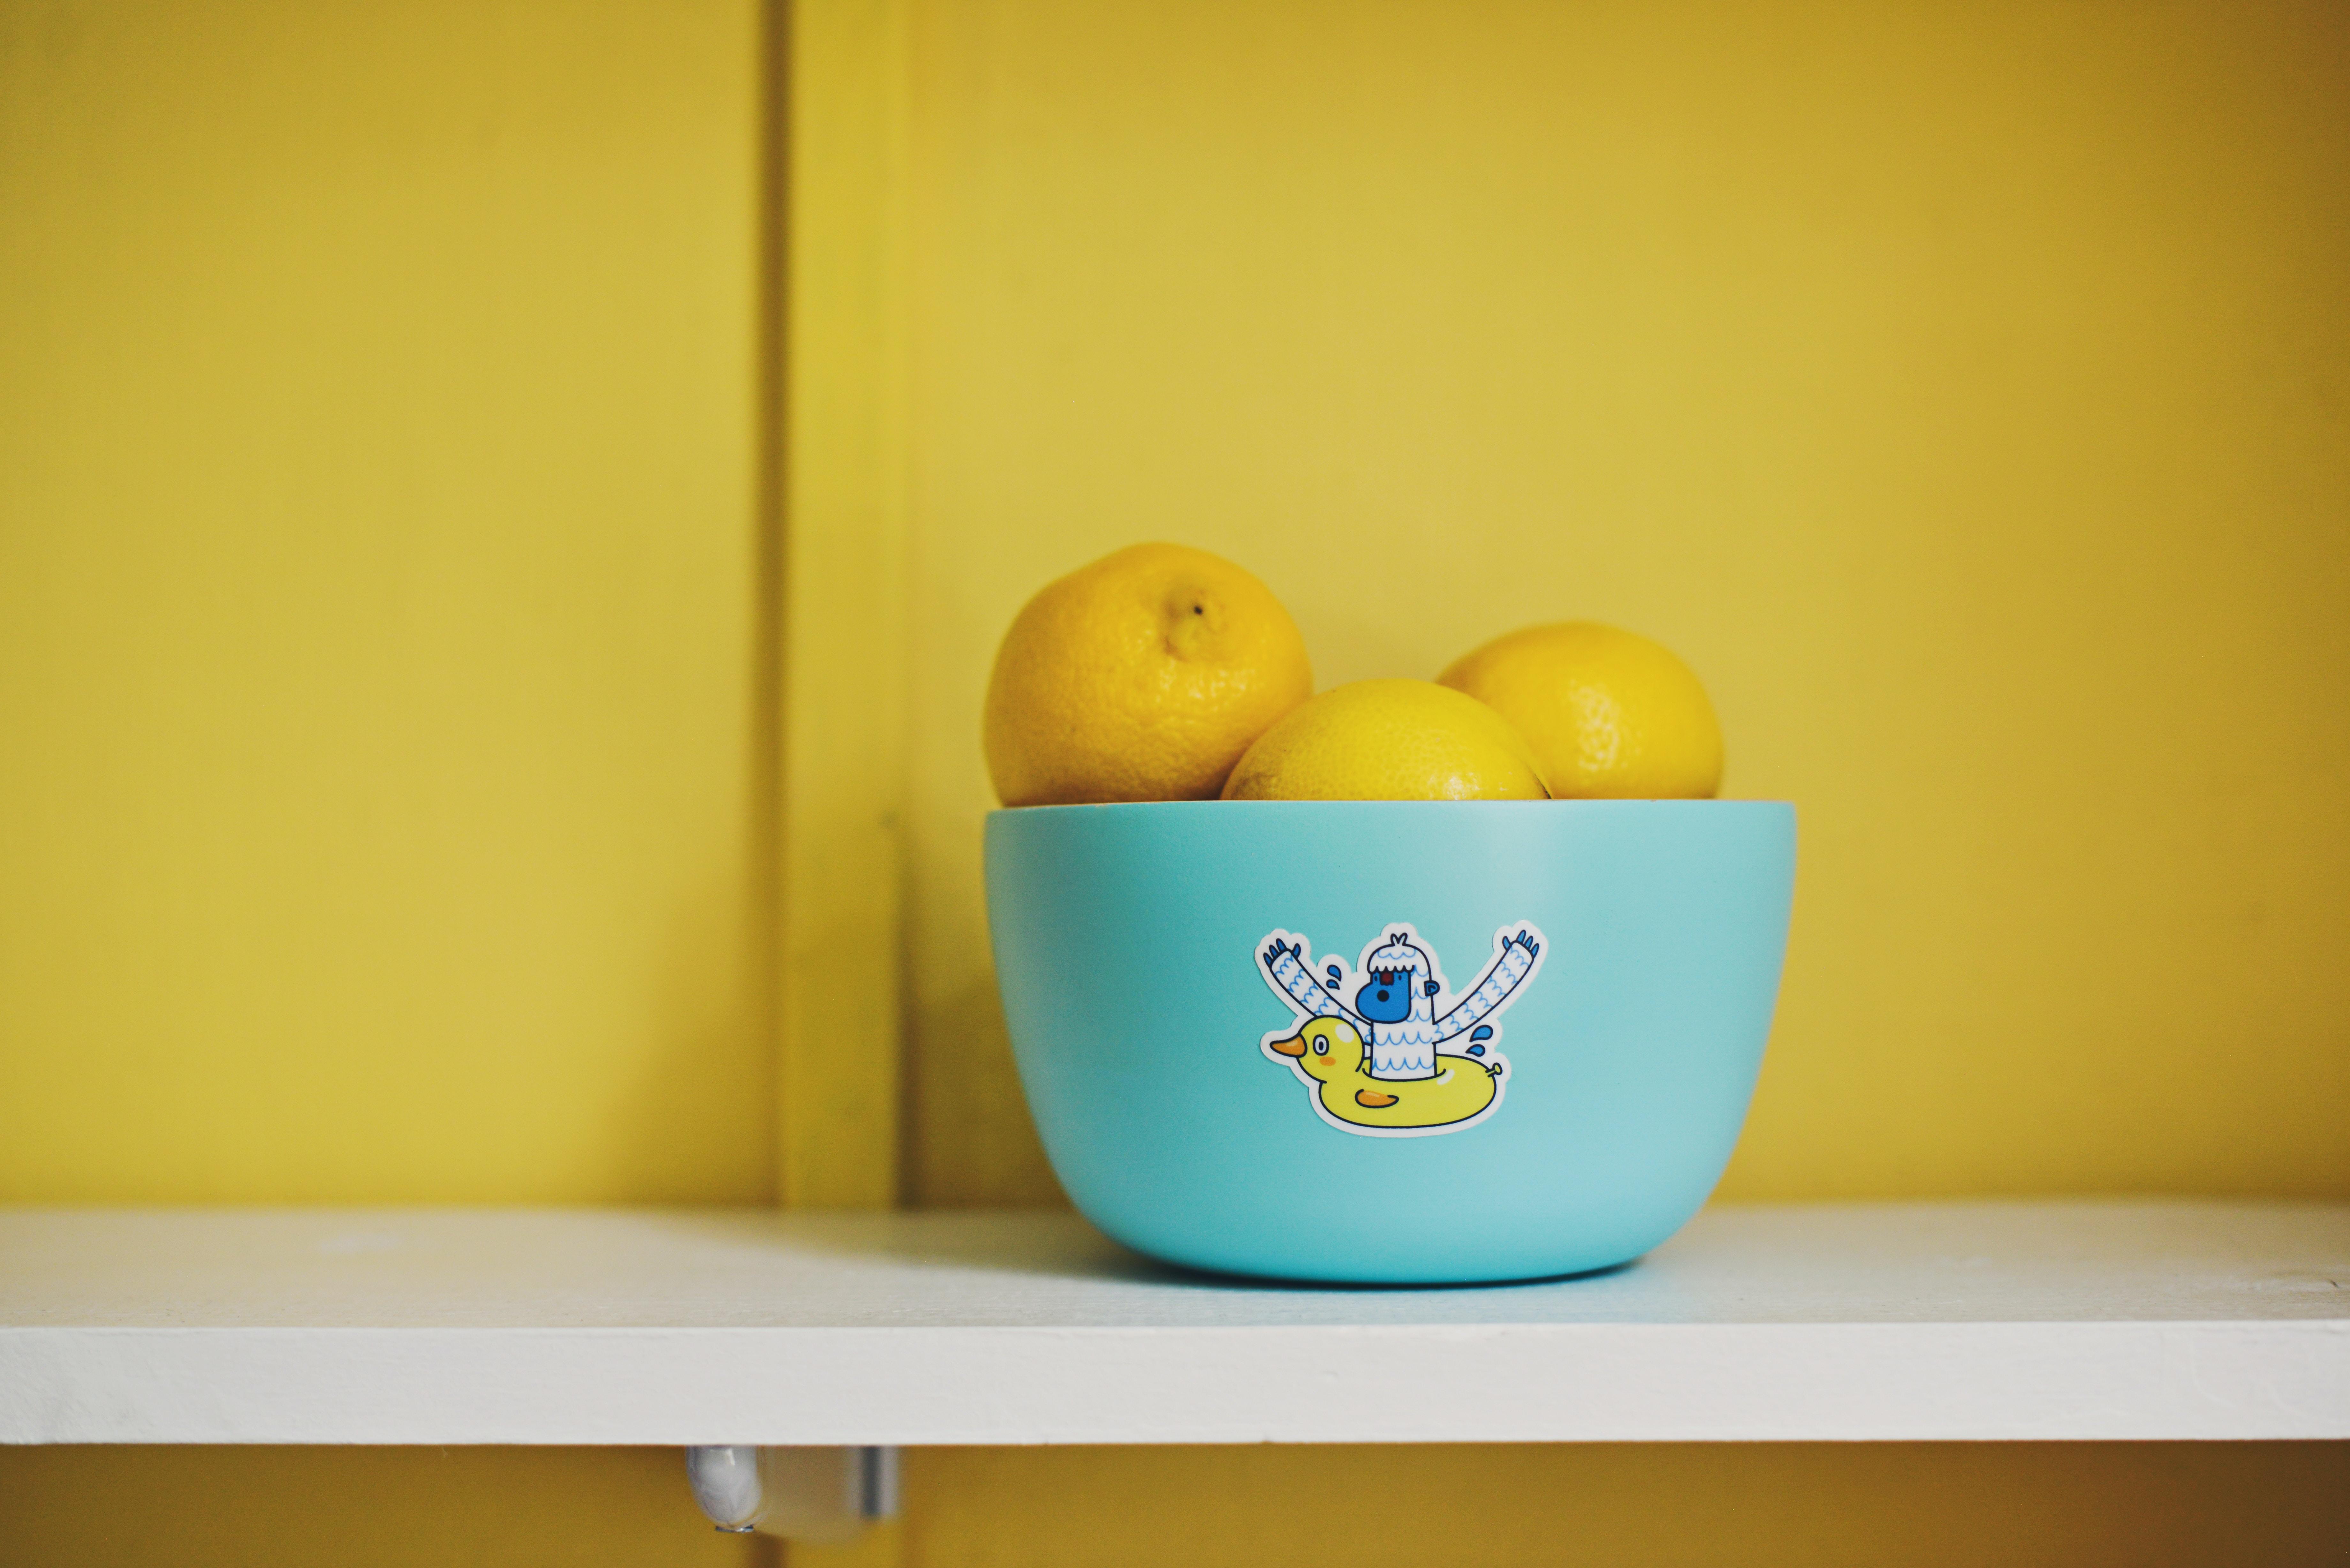 lemon fruits on teal bowl